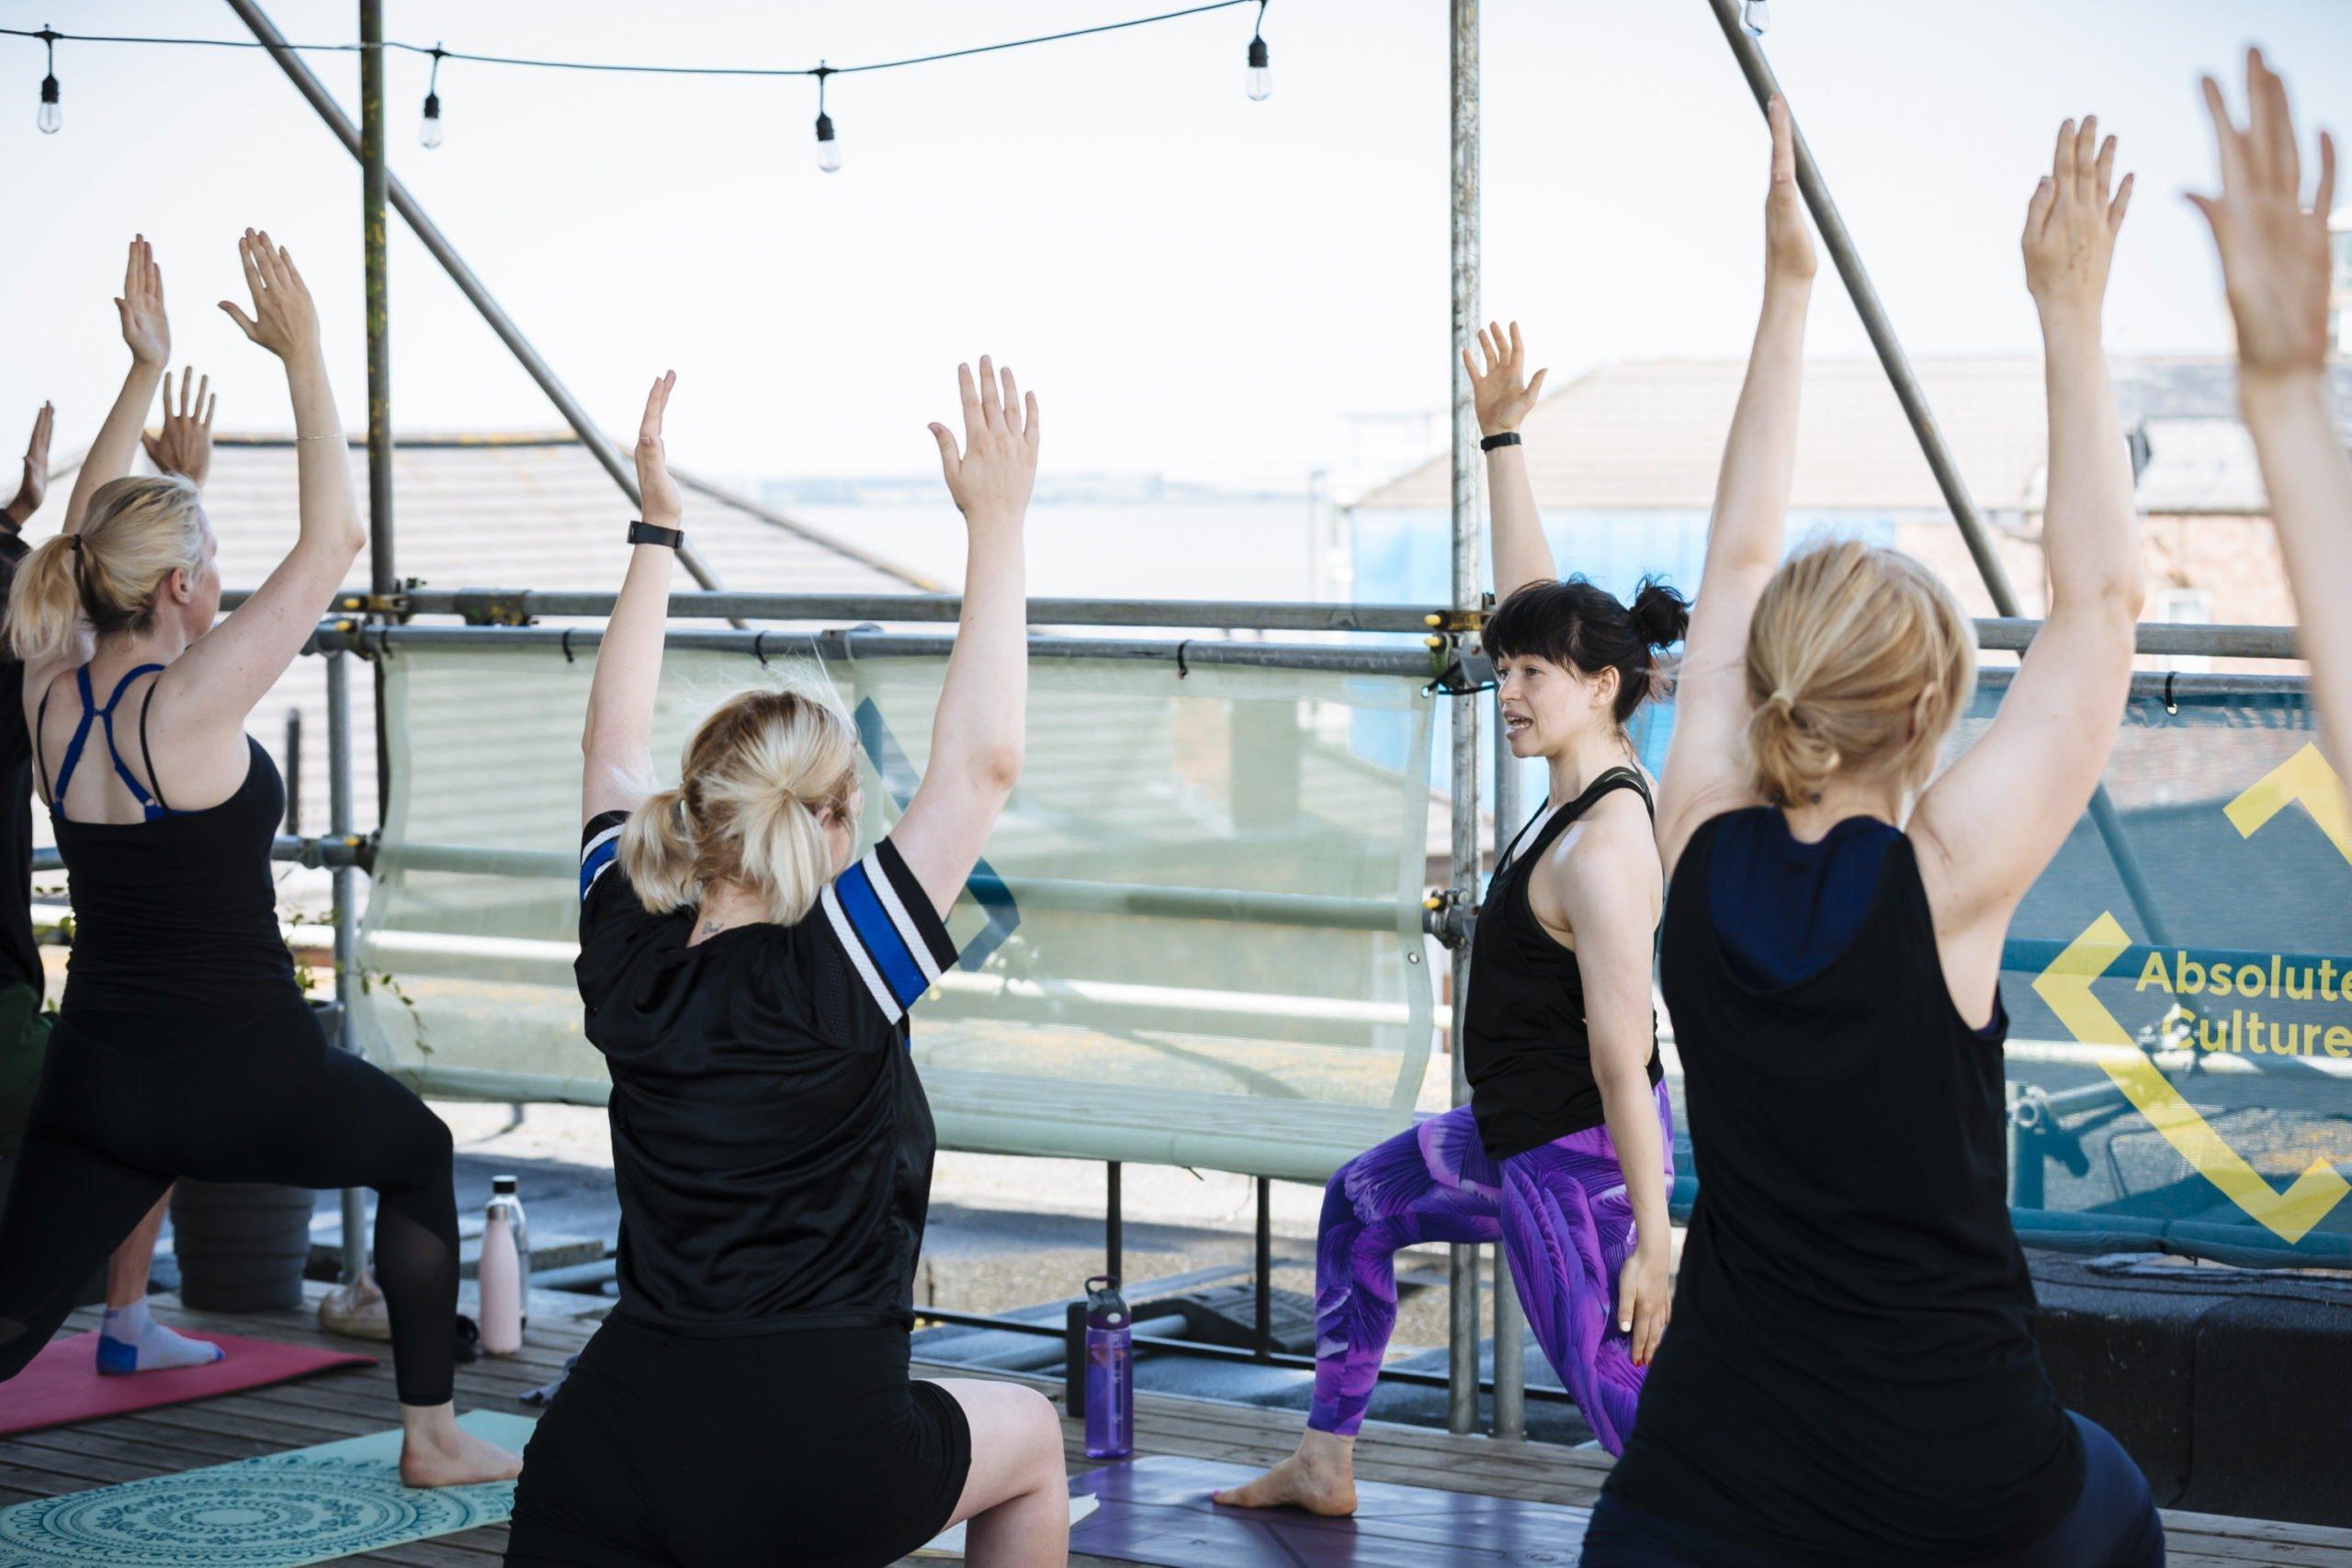 Yoga @ Humber Street Gallery